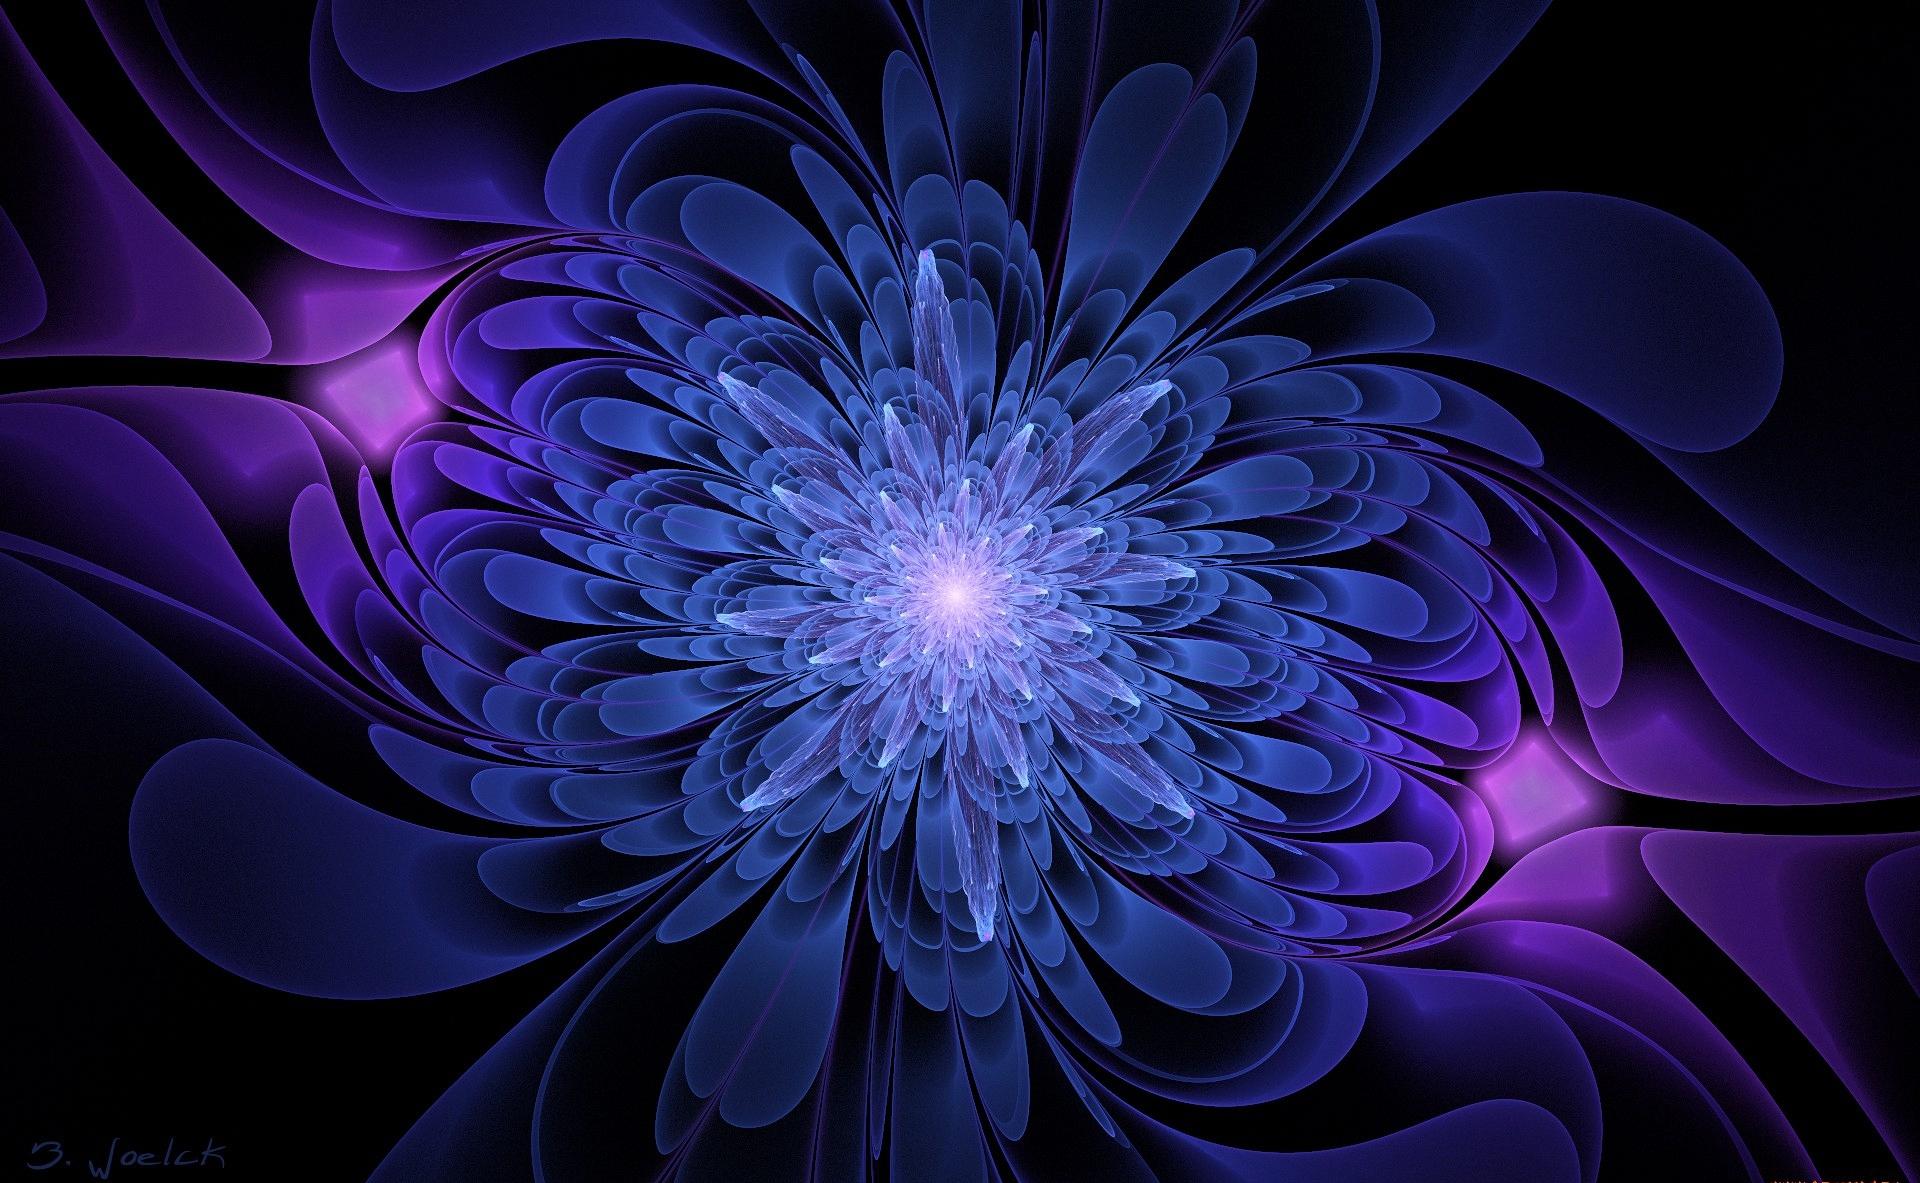 Black background blue and serenevy color graphics flower wallpaper black background blue and serenevy color graphics flower wallpaper 1920x1183 126559 wallpaperup dhlflorist Images